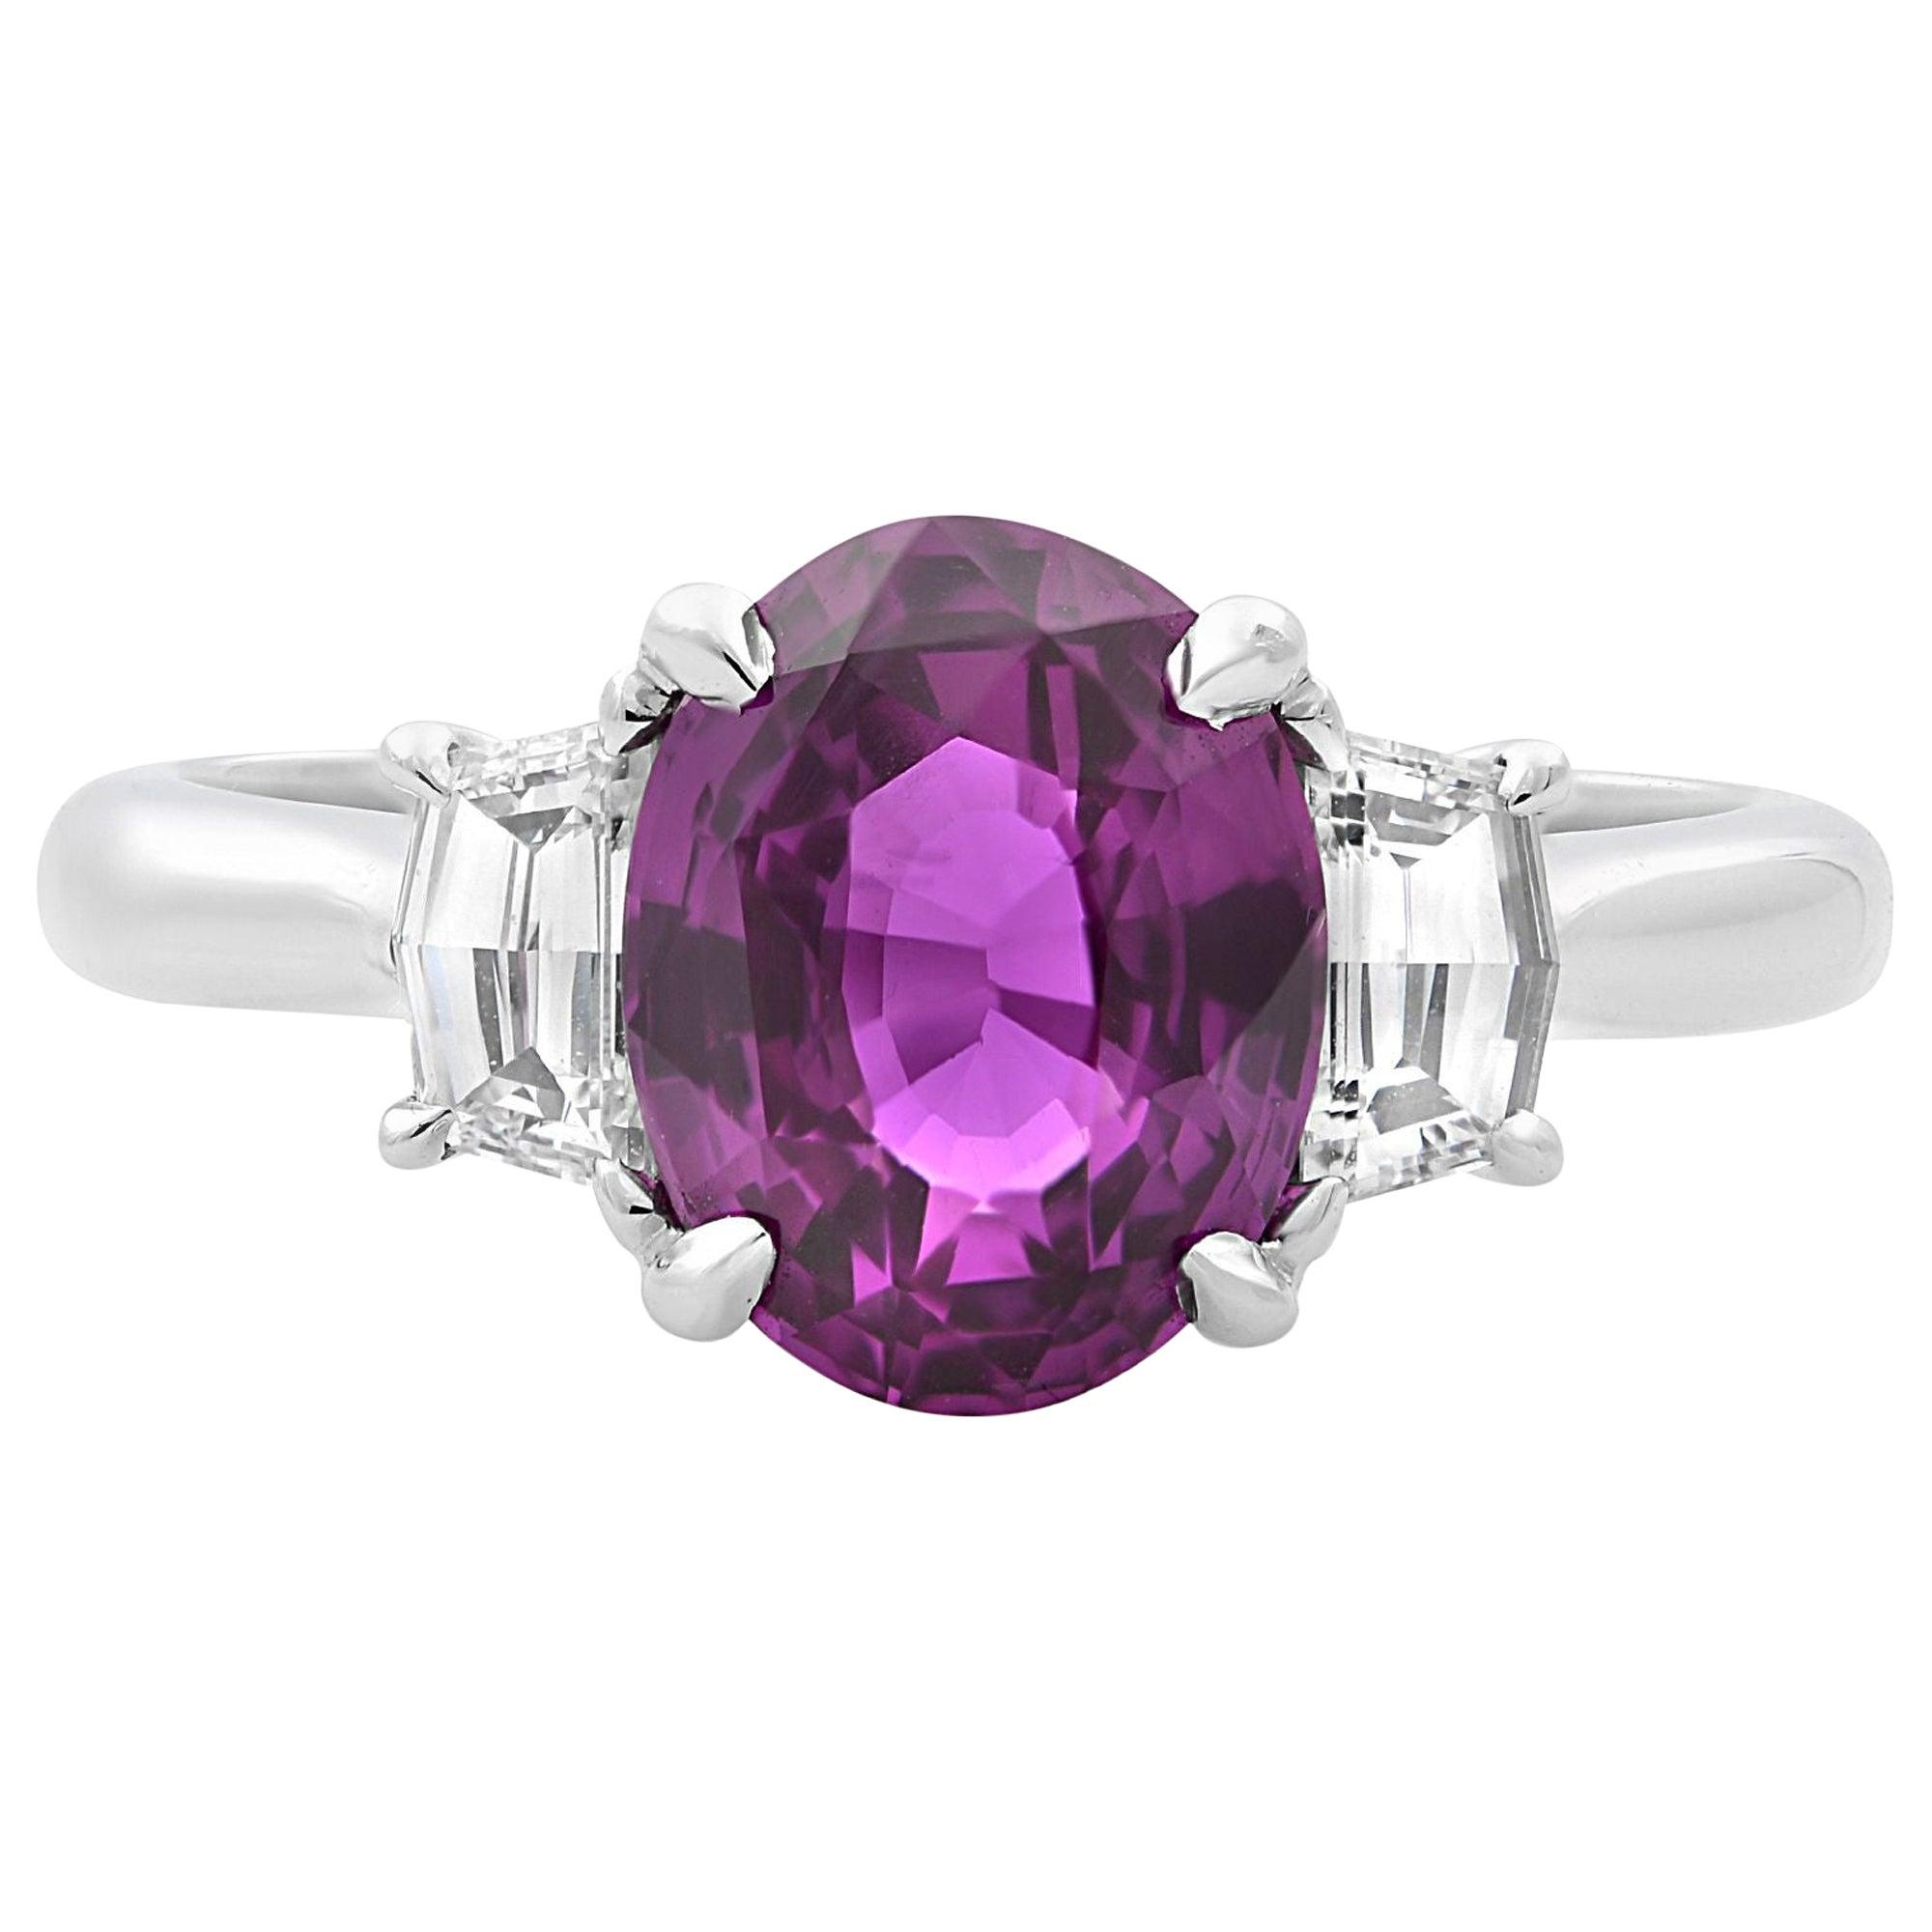 18 Karat White Gold Oval Pink Sapphire and Diamond Three-Stone Ring 2.61 Carat